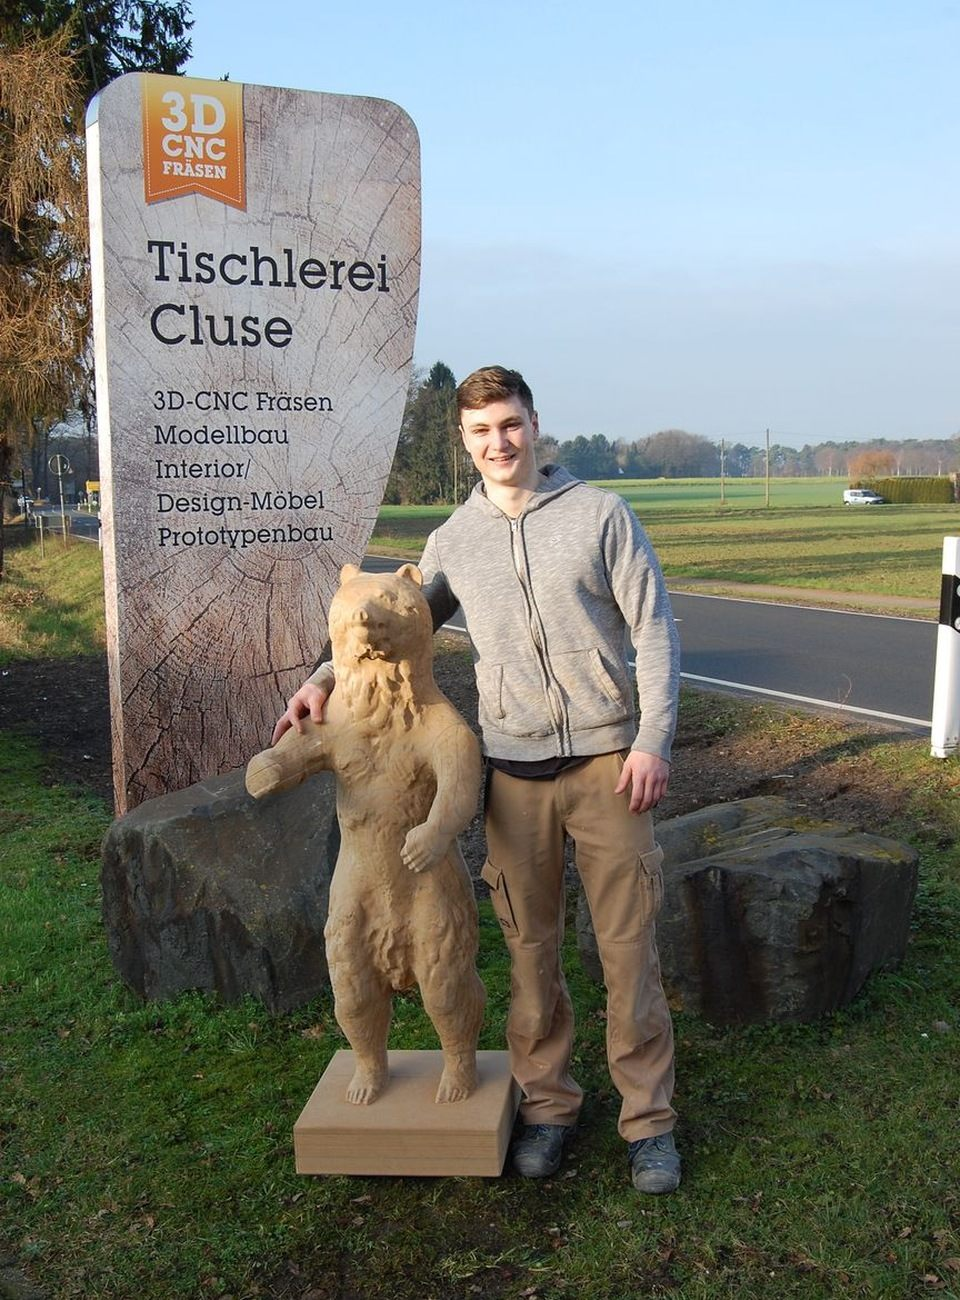 tischlerei-cluse-b065